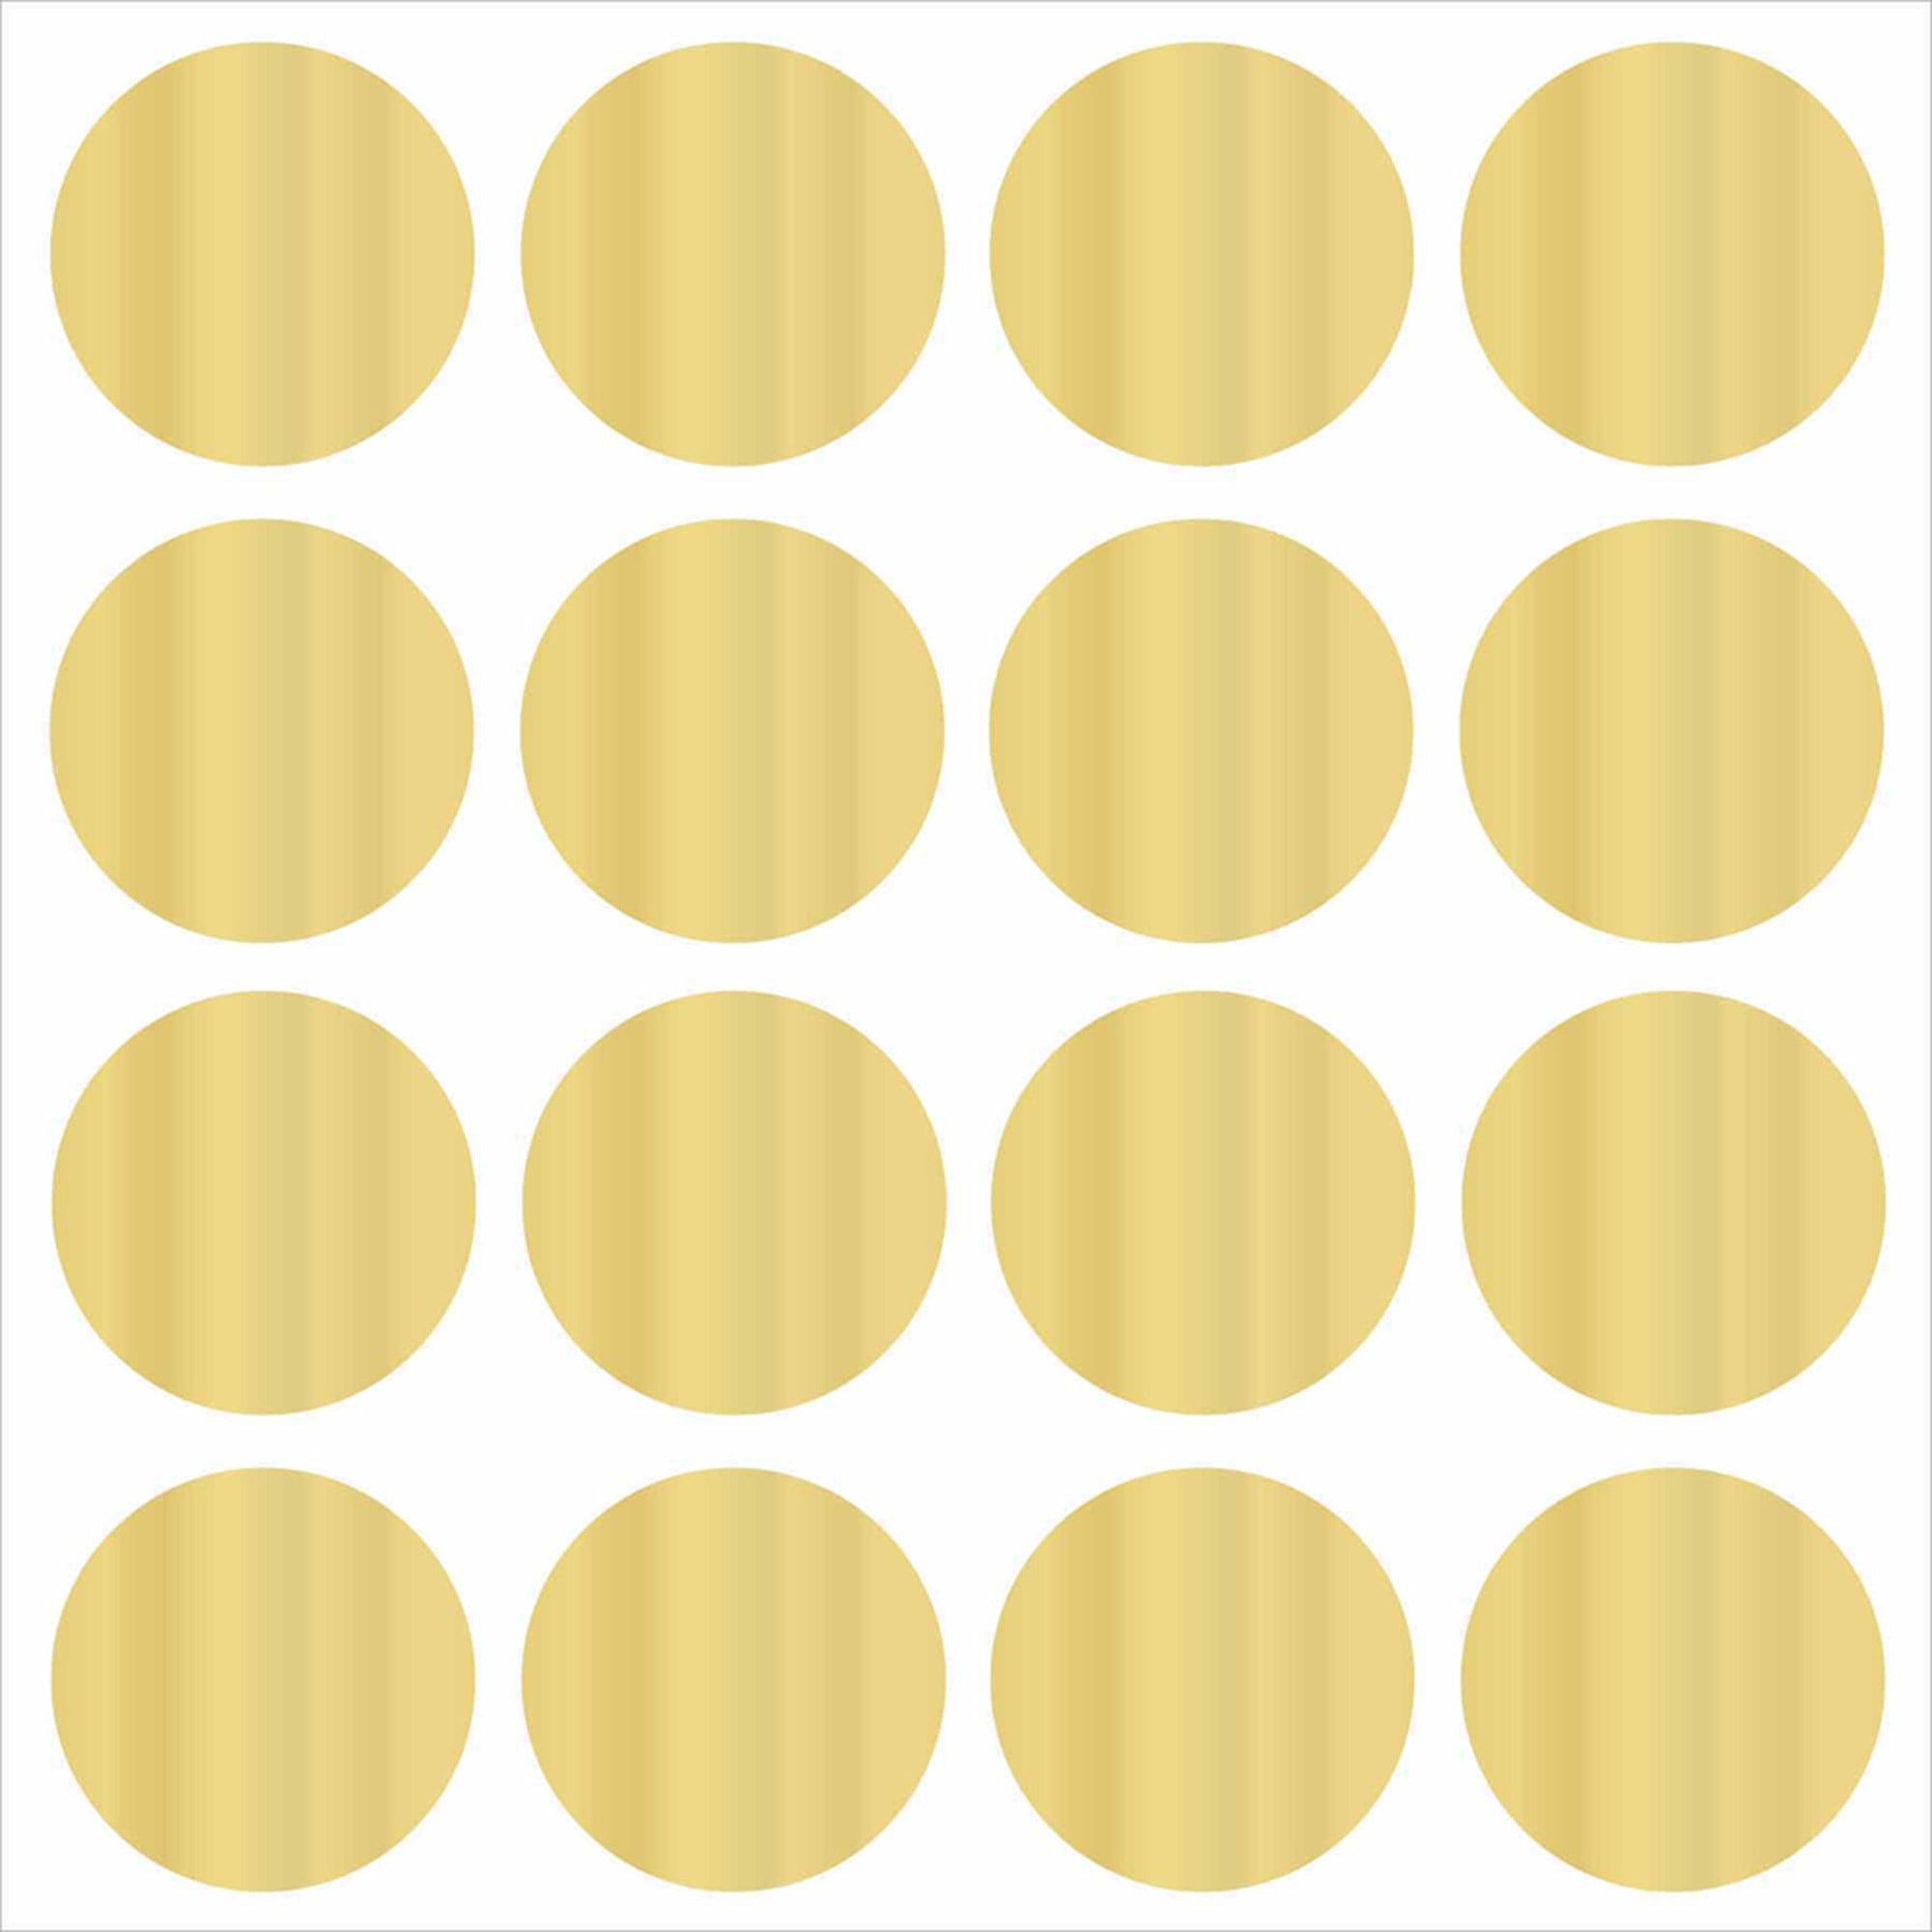 Brewster Confetti Dot Decals - Walmart.com